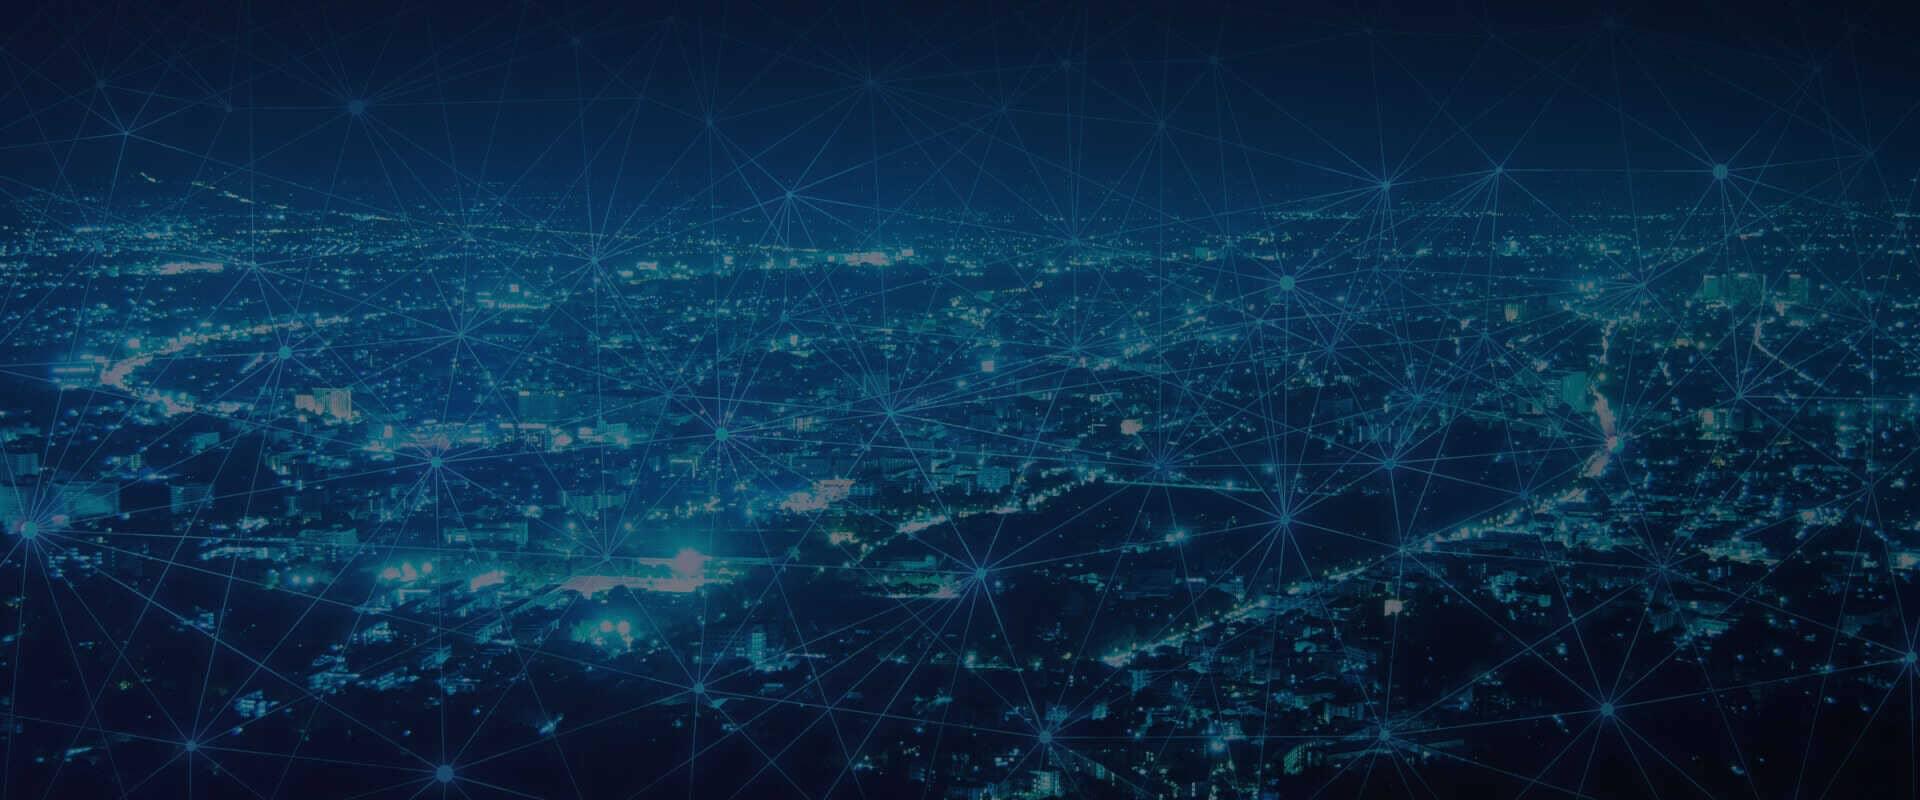 IoT Development & IoT Consulting Services